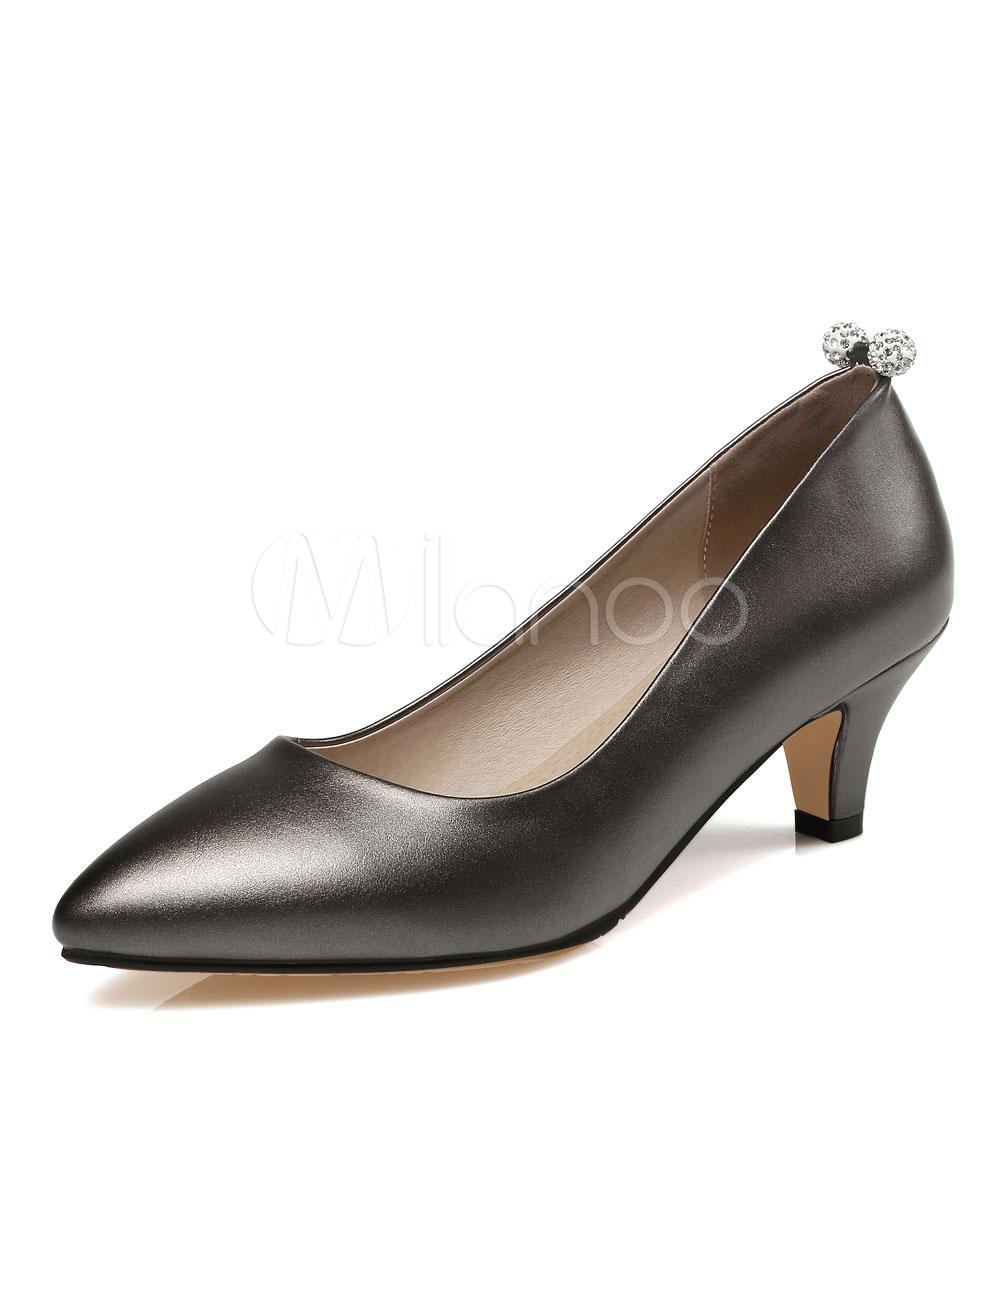 Buy Pointed Toe Pumps Kitten Heel Women's Black Rhinestones Detail Slip On Pump Shoes for $37.99 in Milanoo store